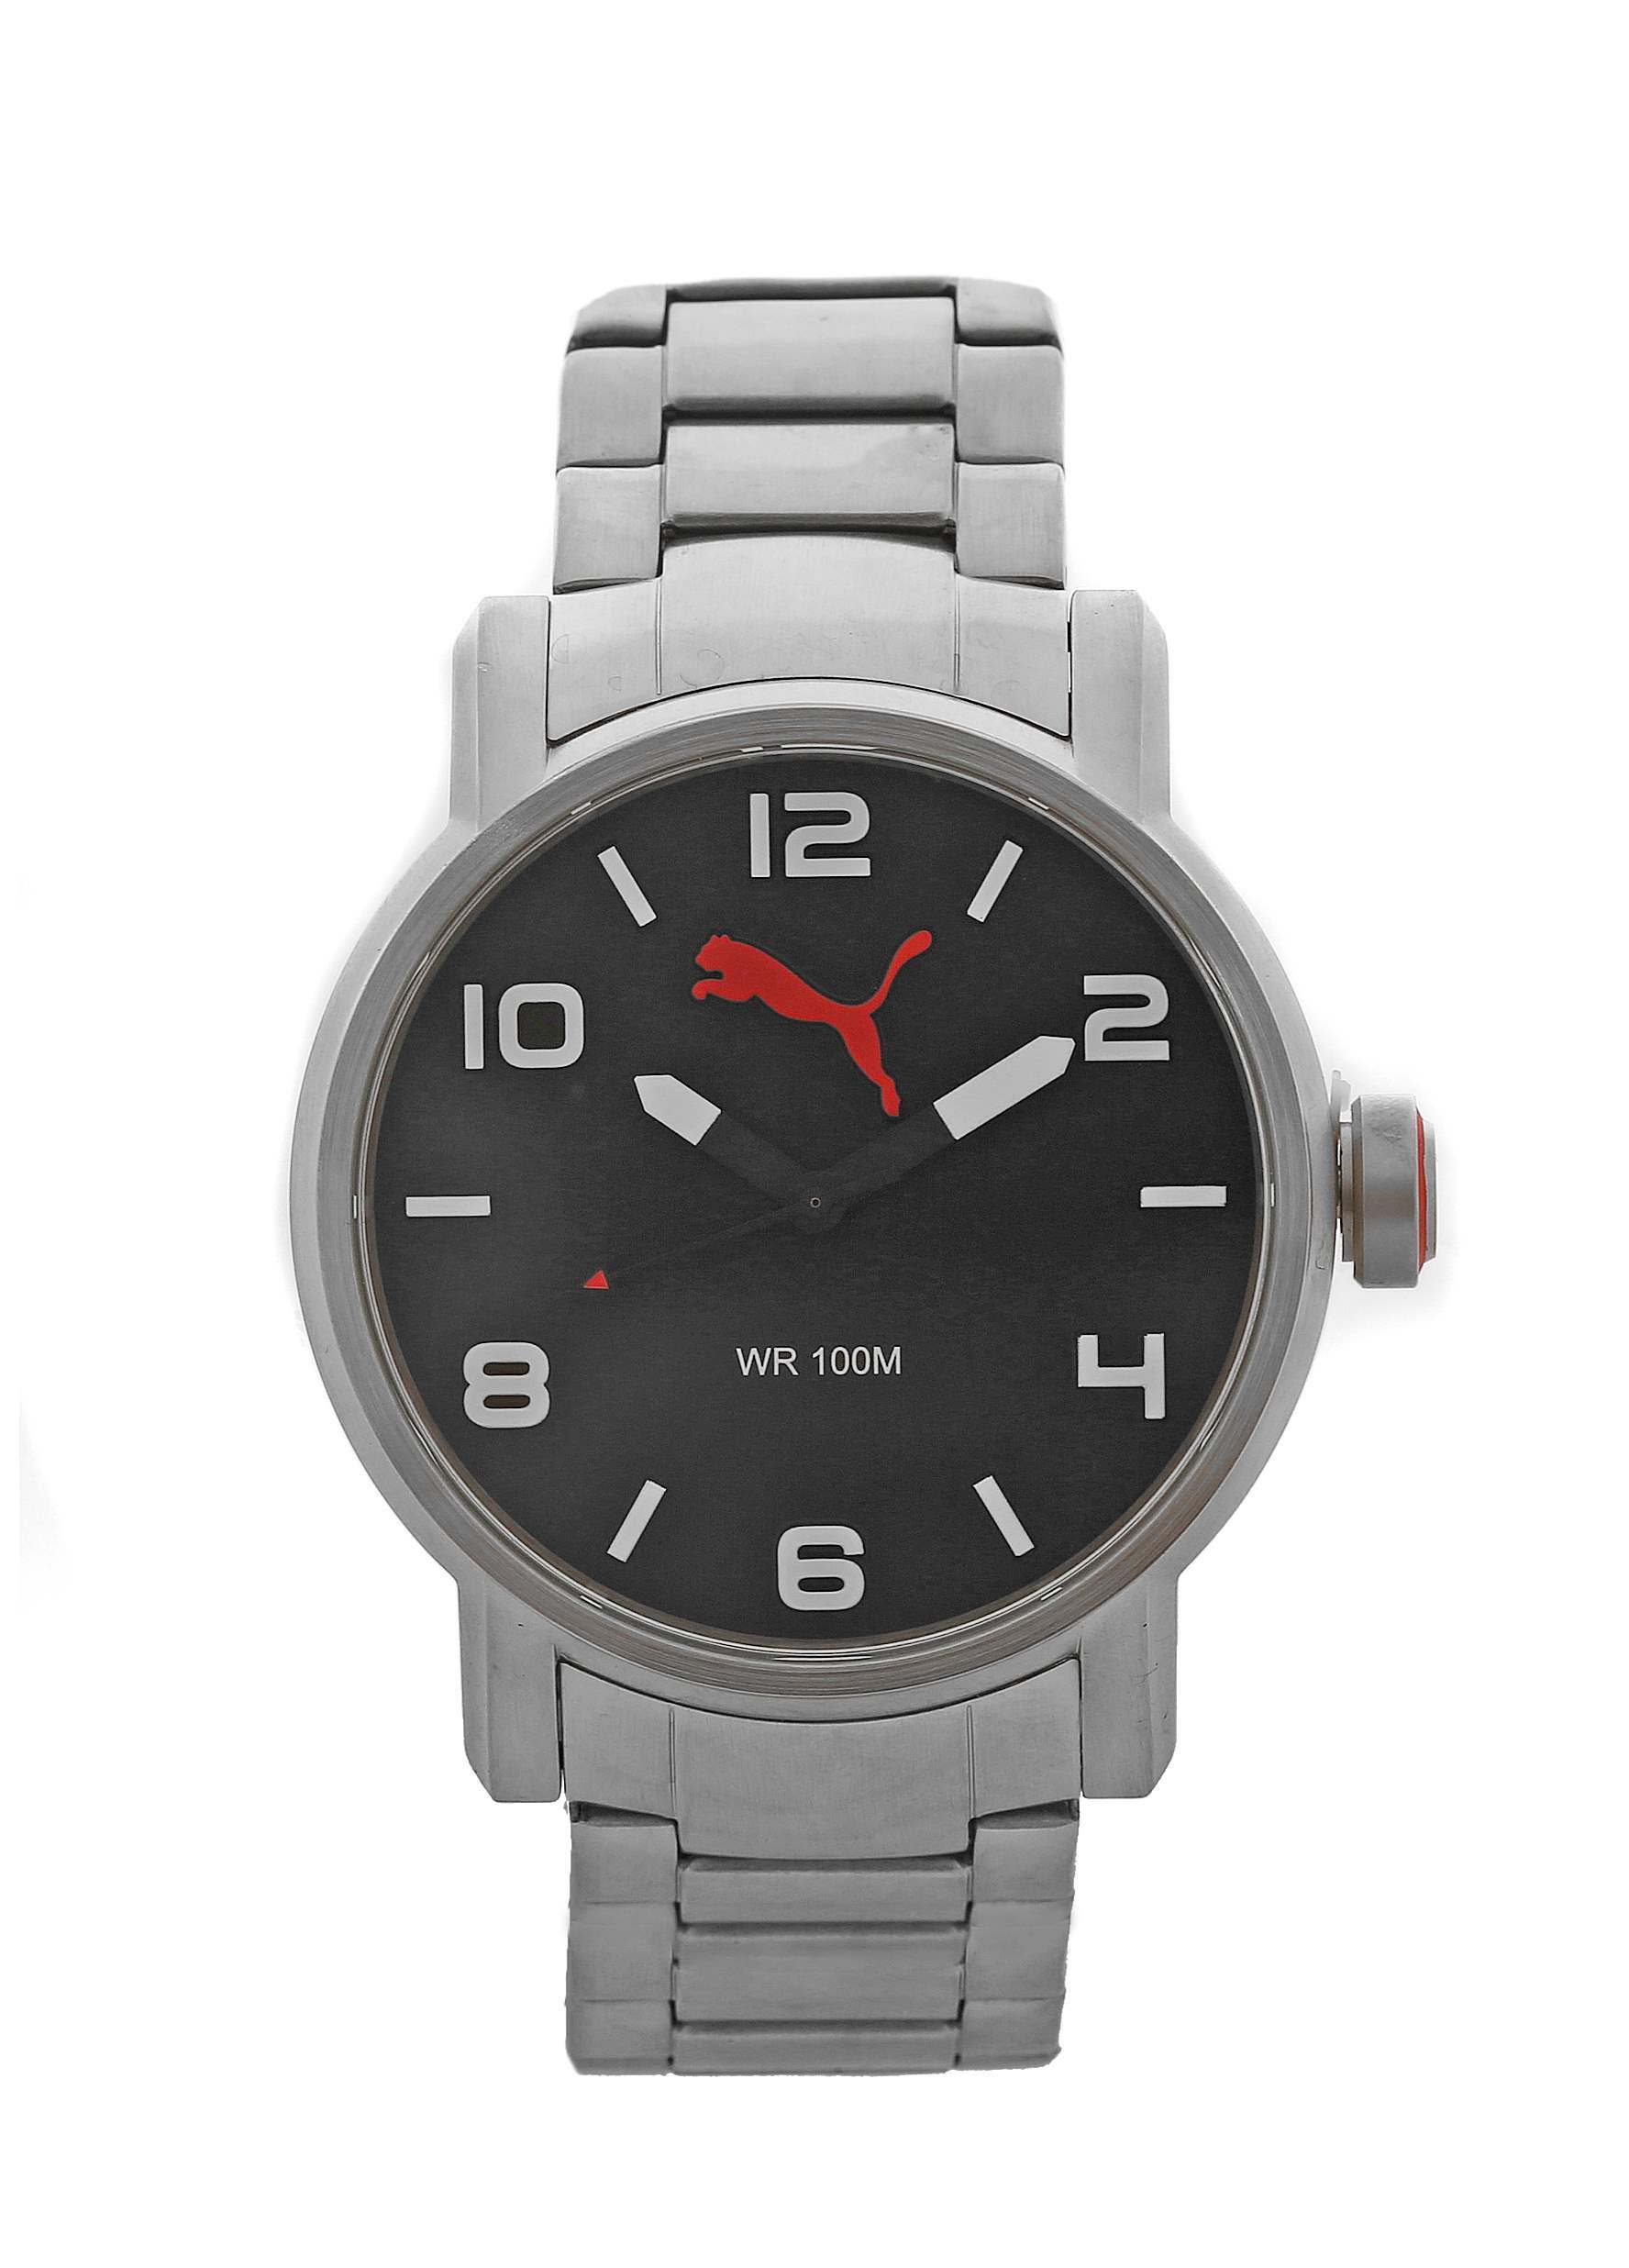 Juicy Watches & More - Ανδρικό Ρολόι PUMA